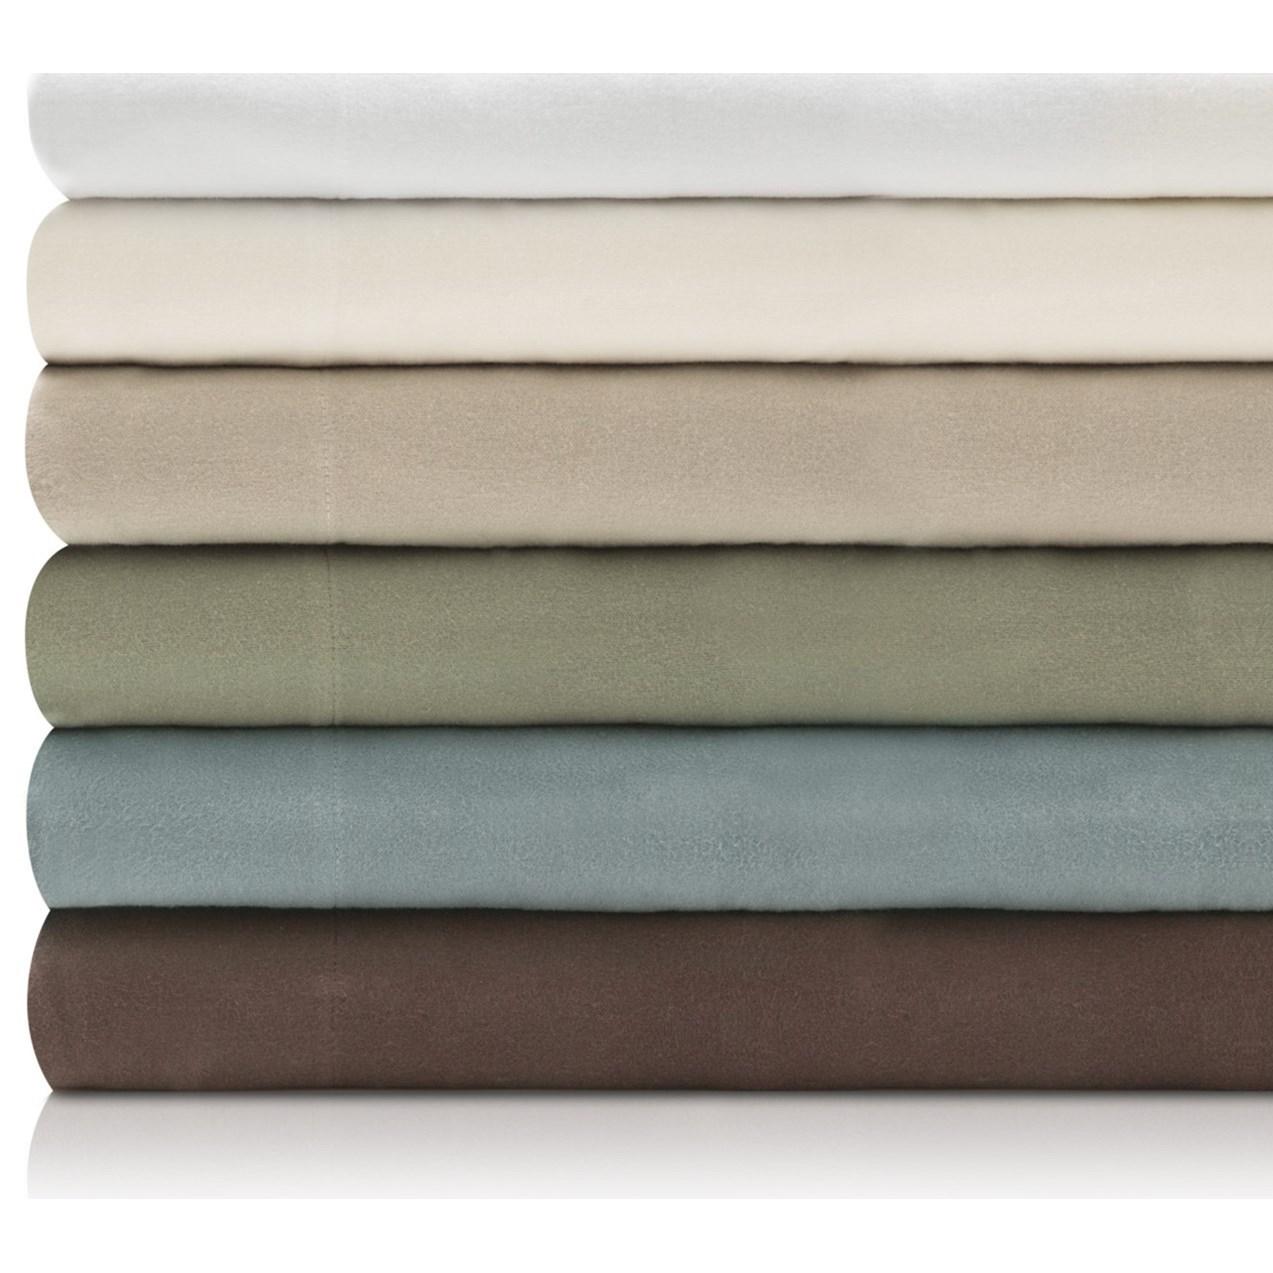 Malouf Portuguese Flannel Queen Woven™ Portuguese Flannel Sheet Set - Item Number: WO19QQOAFS